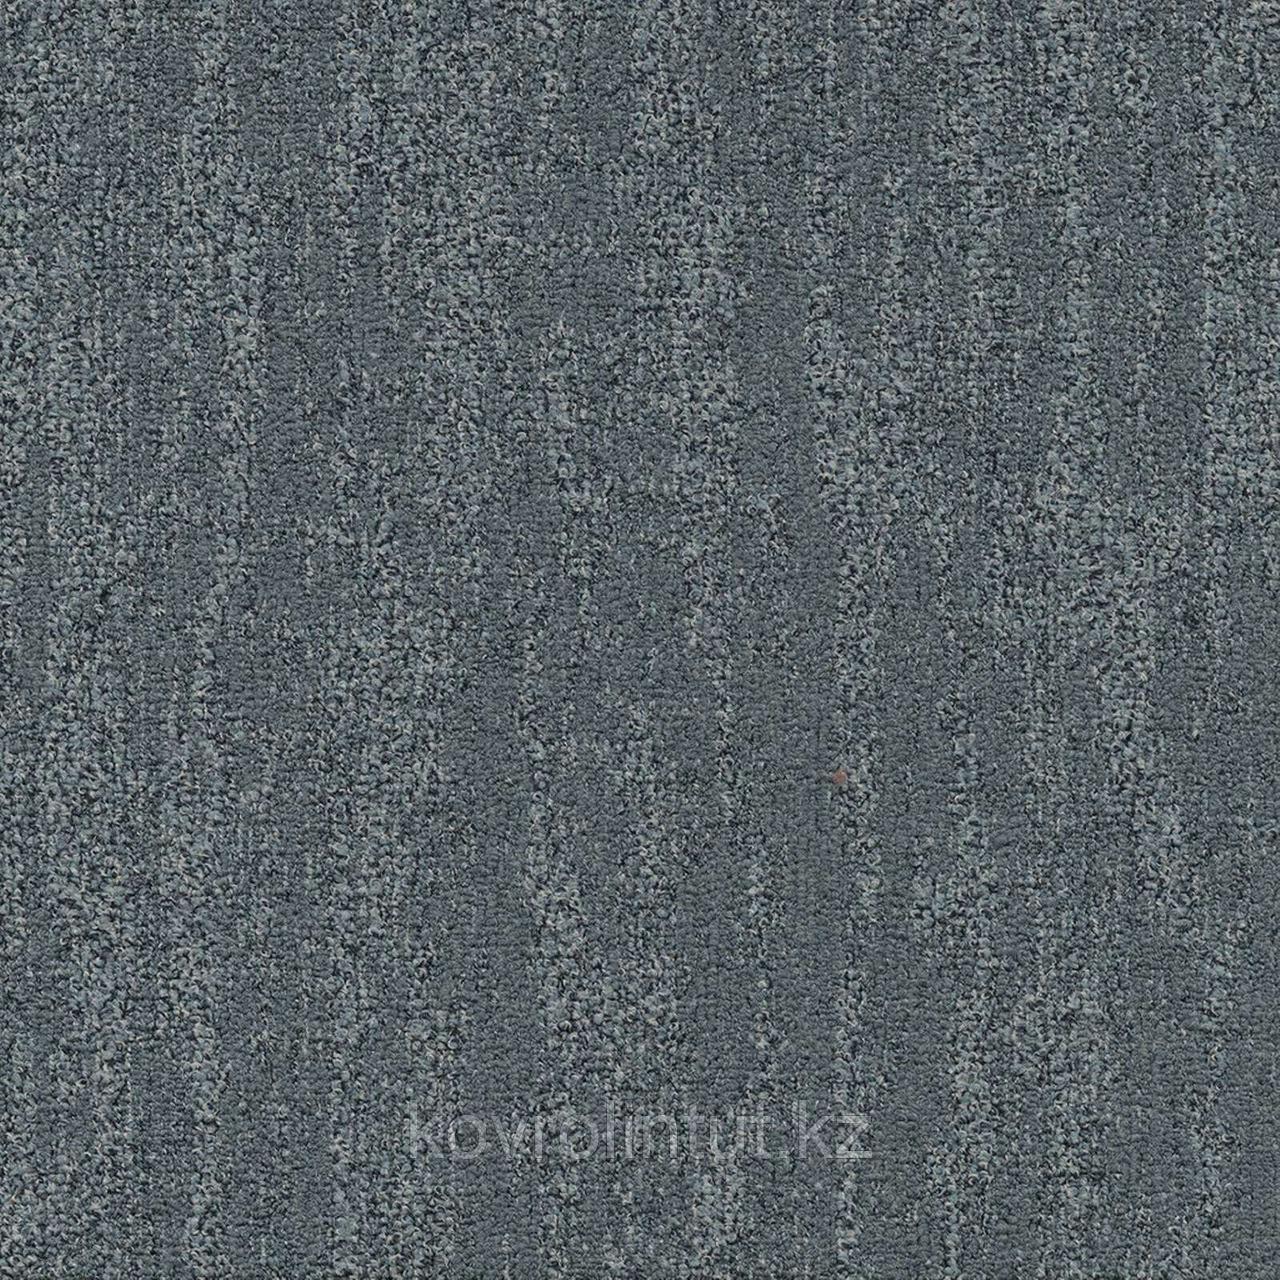 Плитка ковровая Modulyss Willow 586, 100% PA